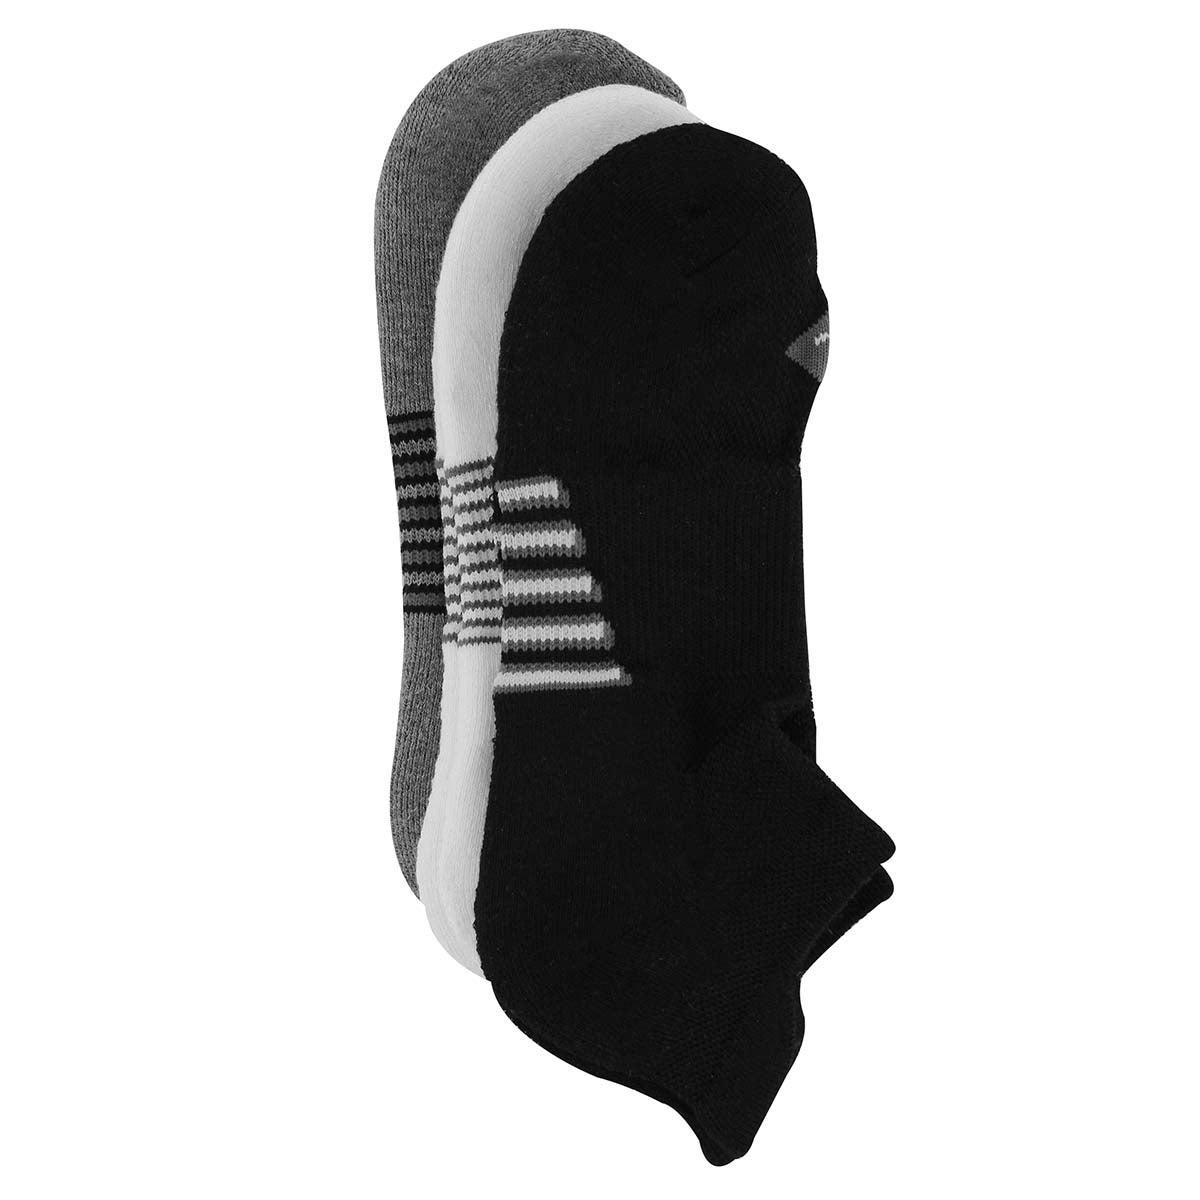 Mns Action Stripe bk/wt/gry sock- 3 pk